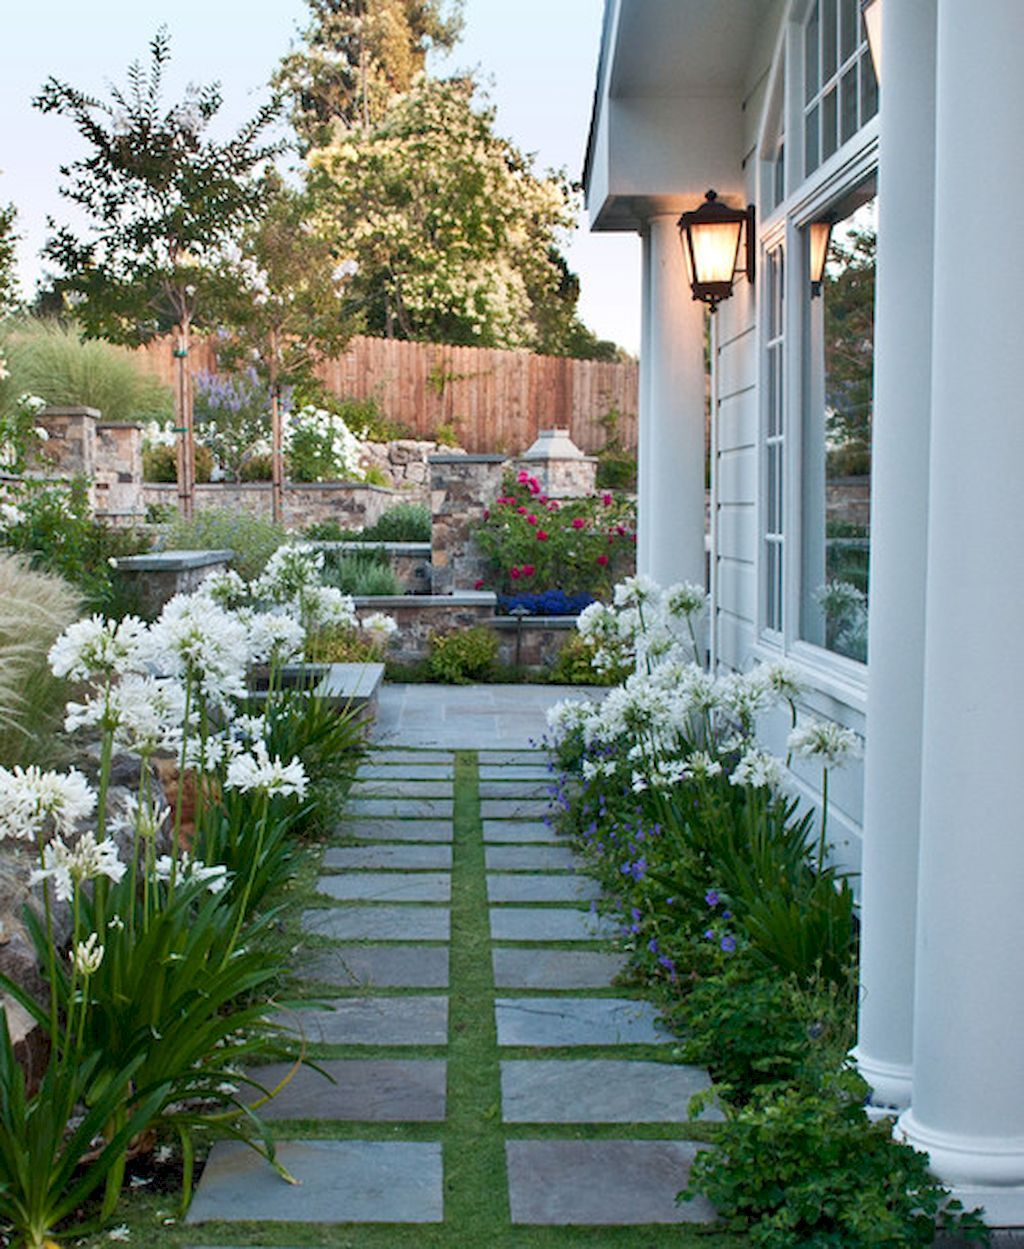 60 Beautiful Front Yard Rock Garden And Landscaping Ideas: 60 Beautiful Side Yard Garden Design Landscaping Ideas